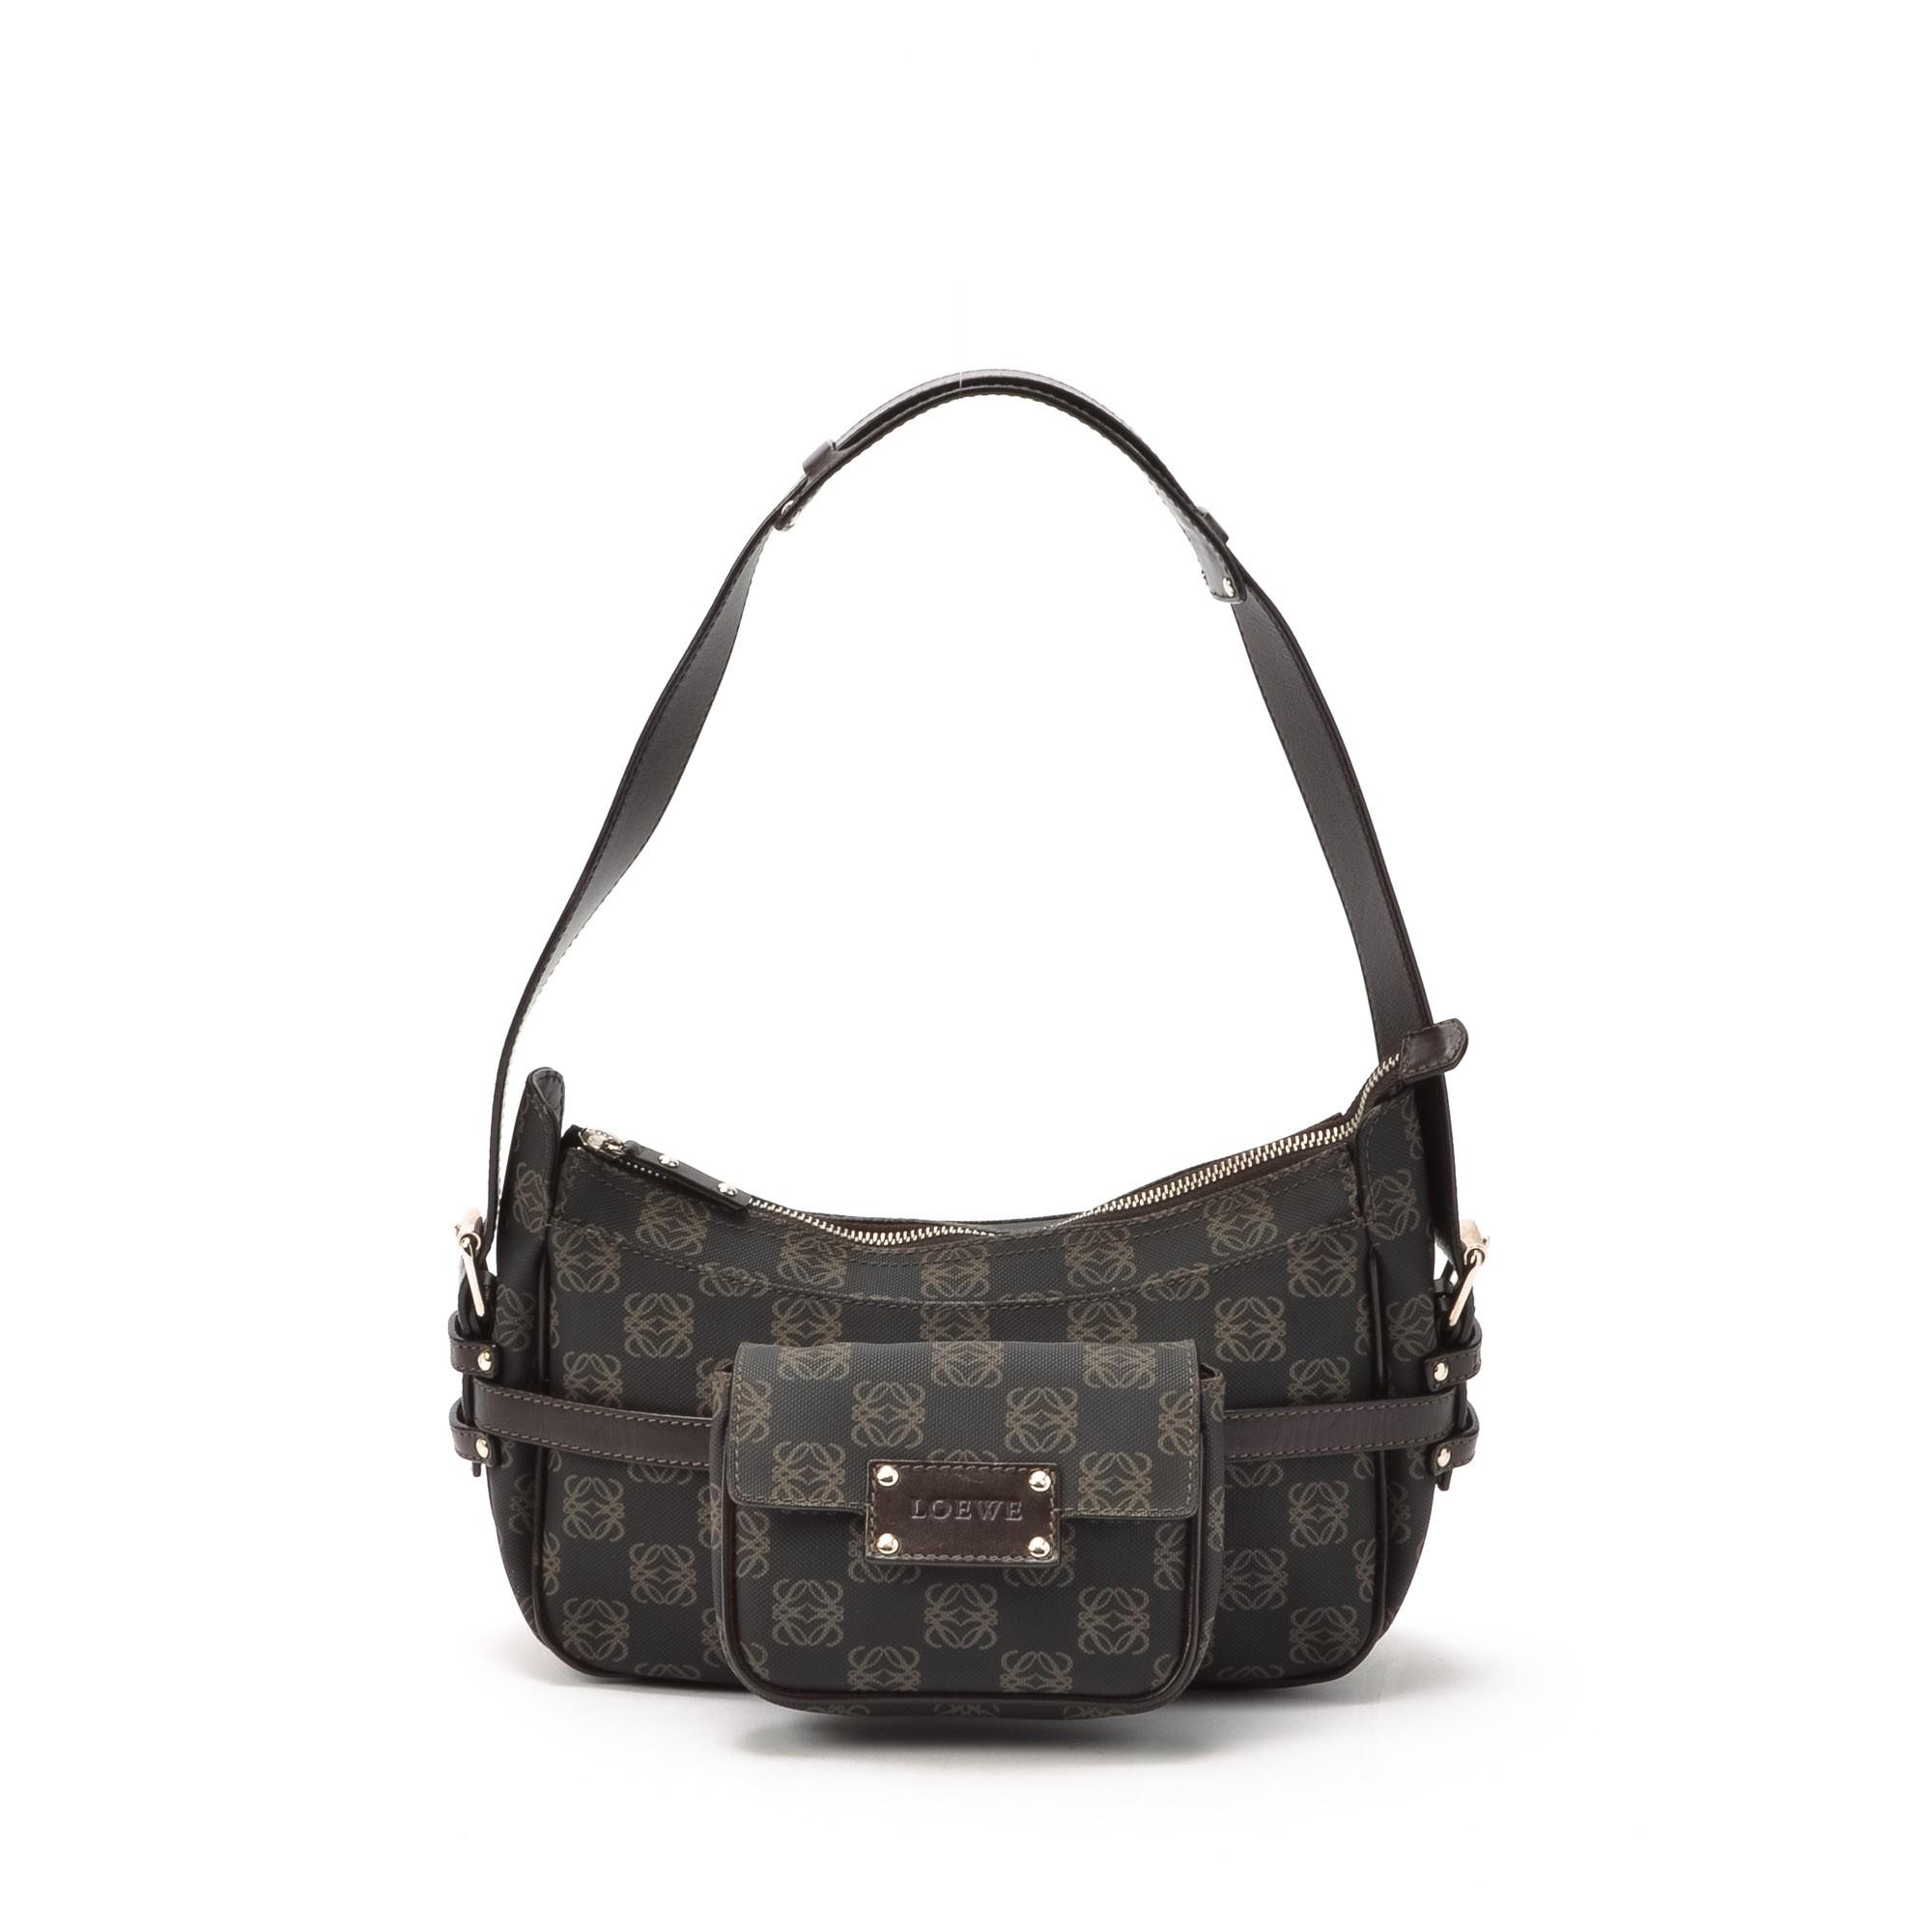 Buy Dark Grey Pvc Loewe Shoulder Bag At Lxr Amp Co